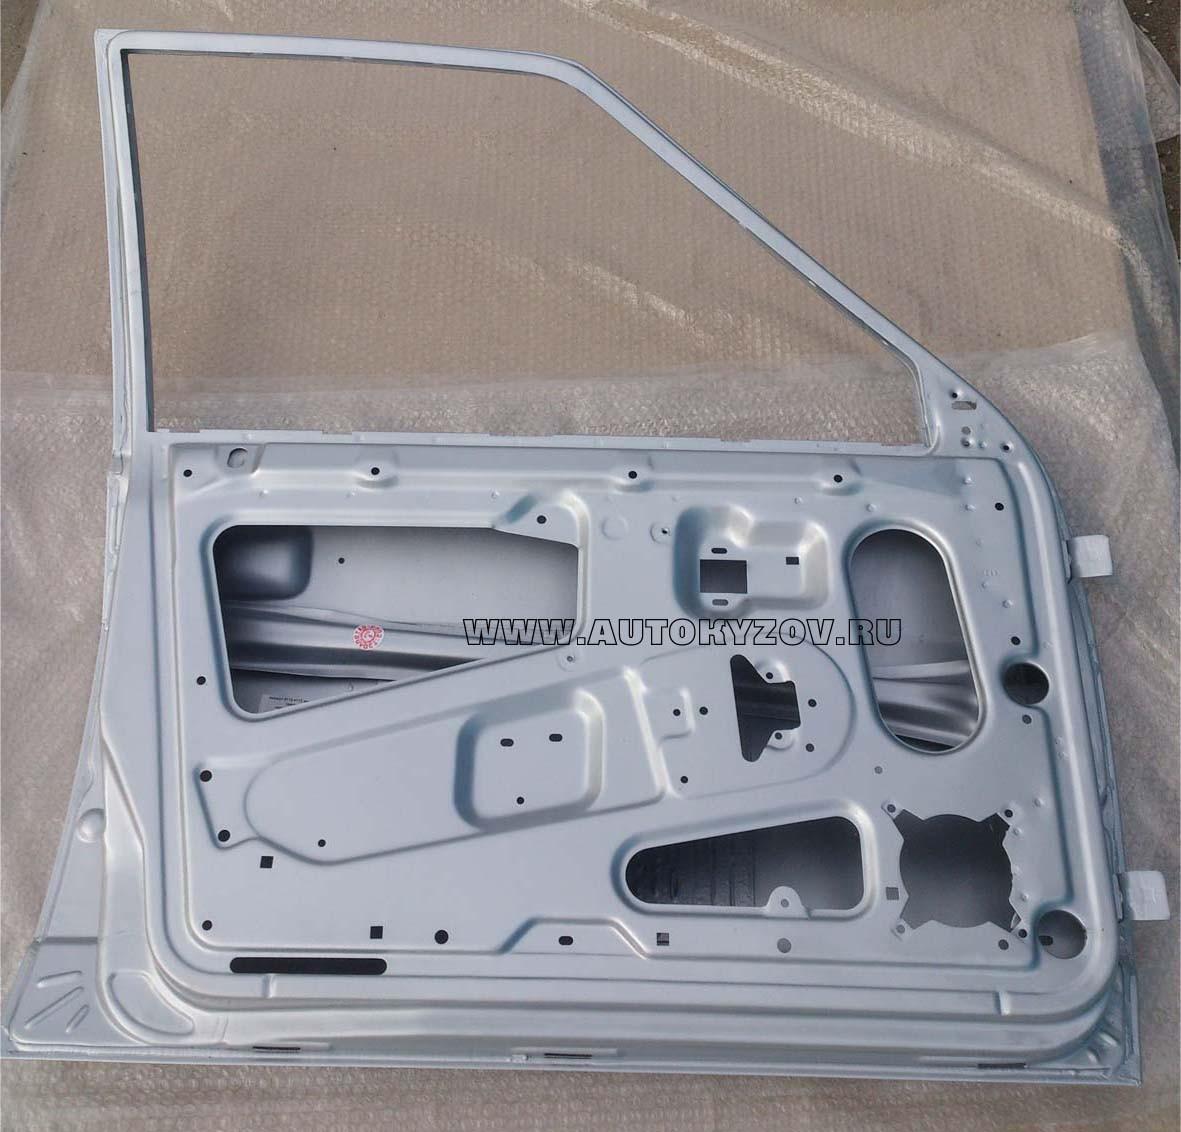 Авторазборка Suzuki GRAND VITARA XL- avtopro